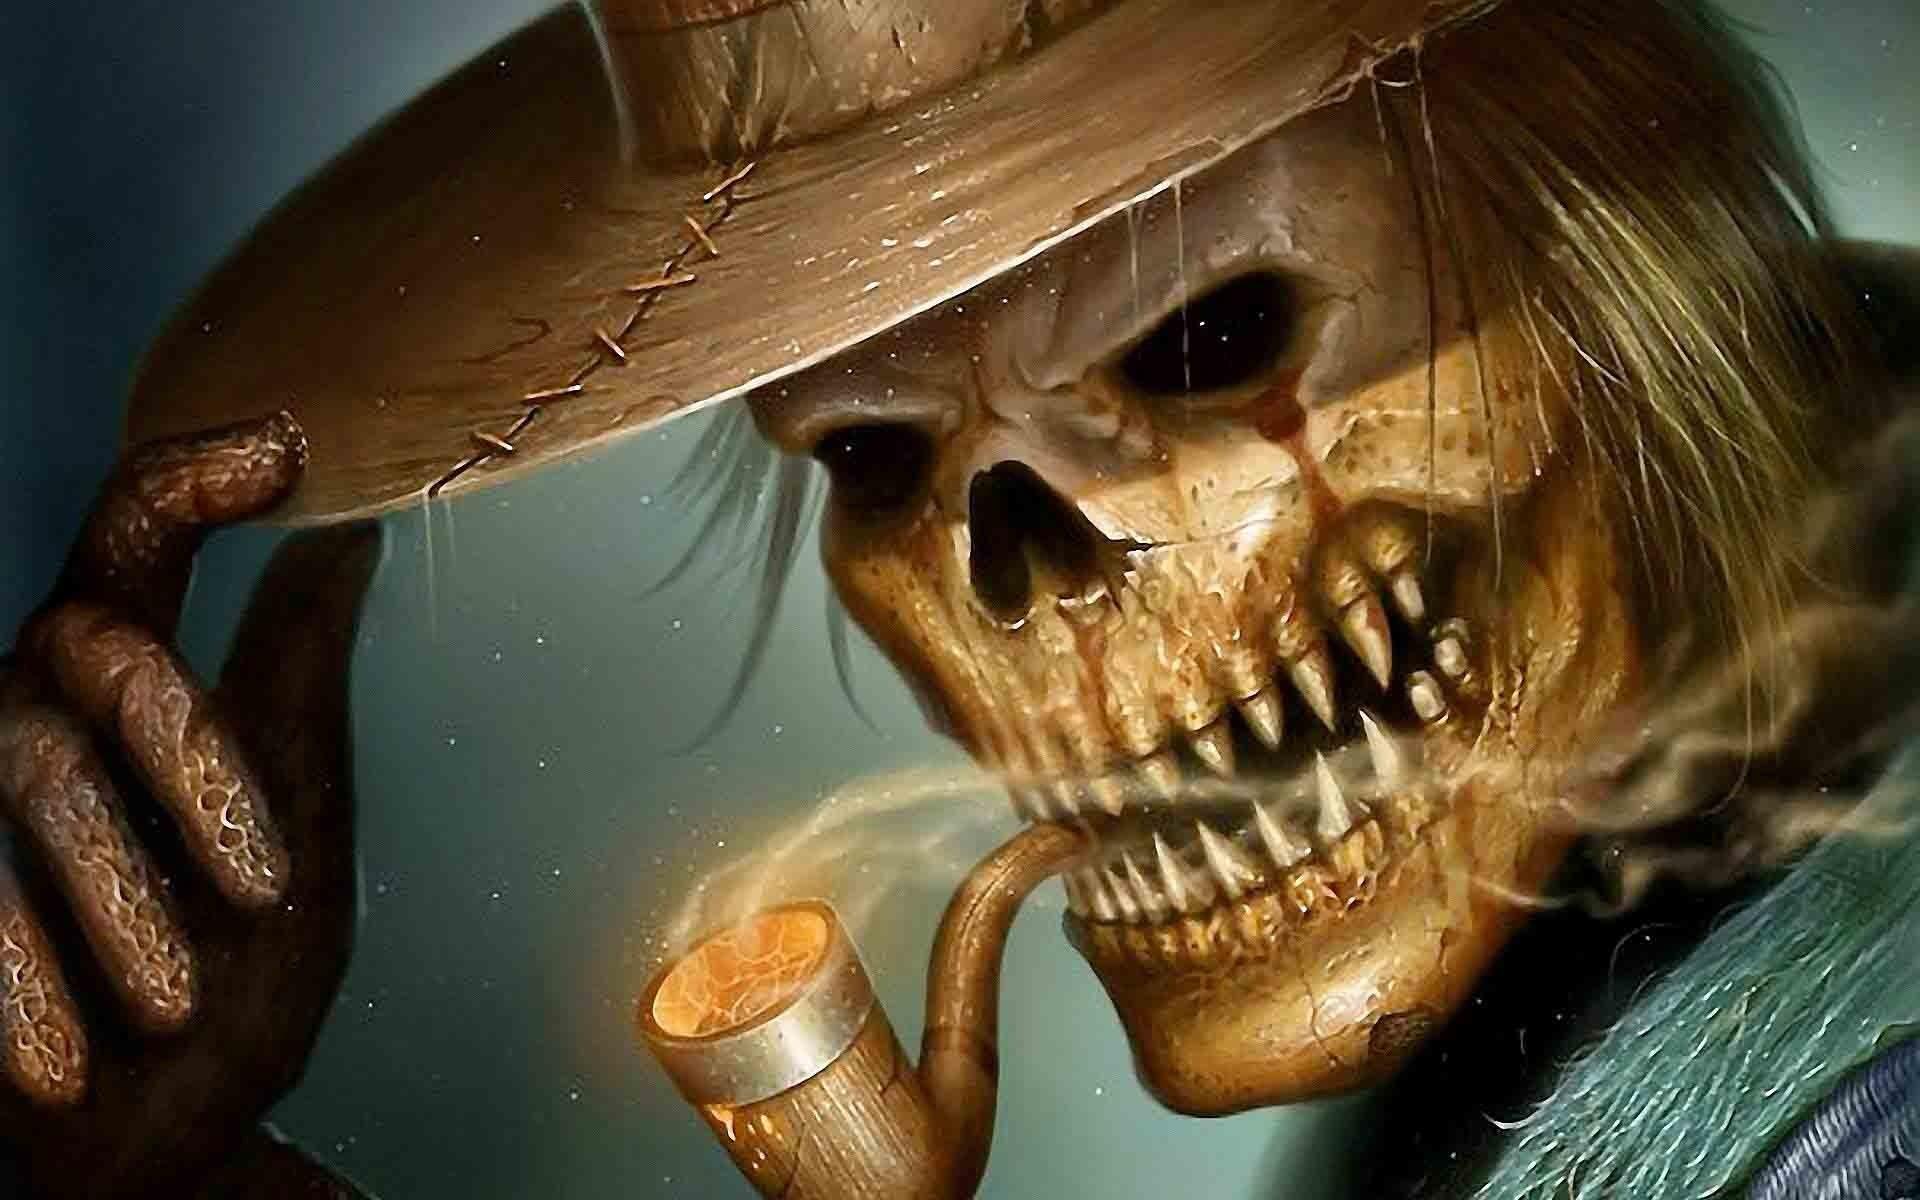 1920x1200 Funny Skeleton Wallpaper Best HD Images of Skeleton HD | HD Wallpapers | Pinterest |